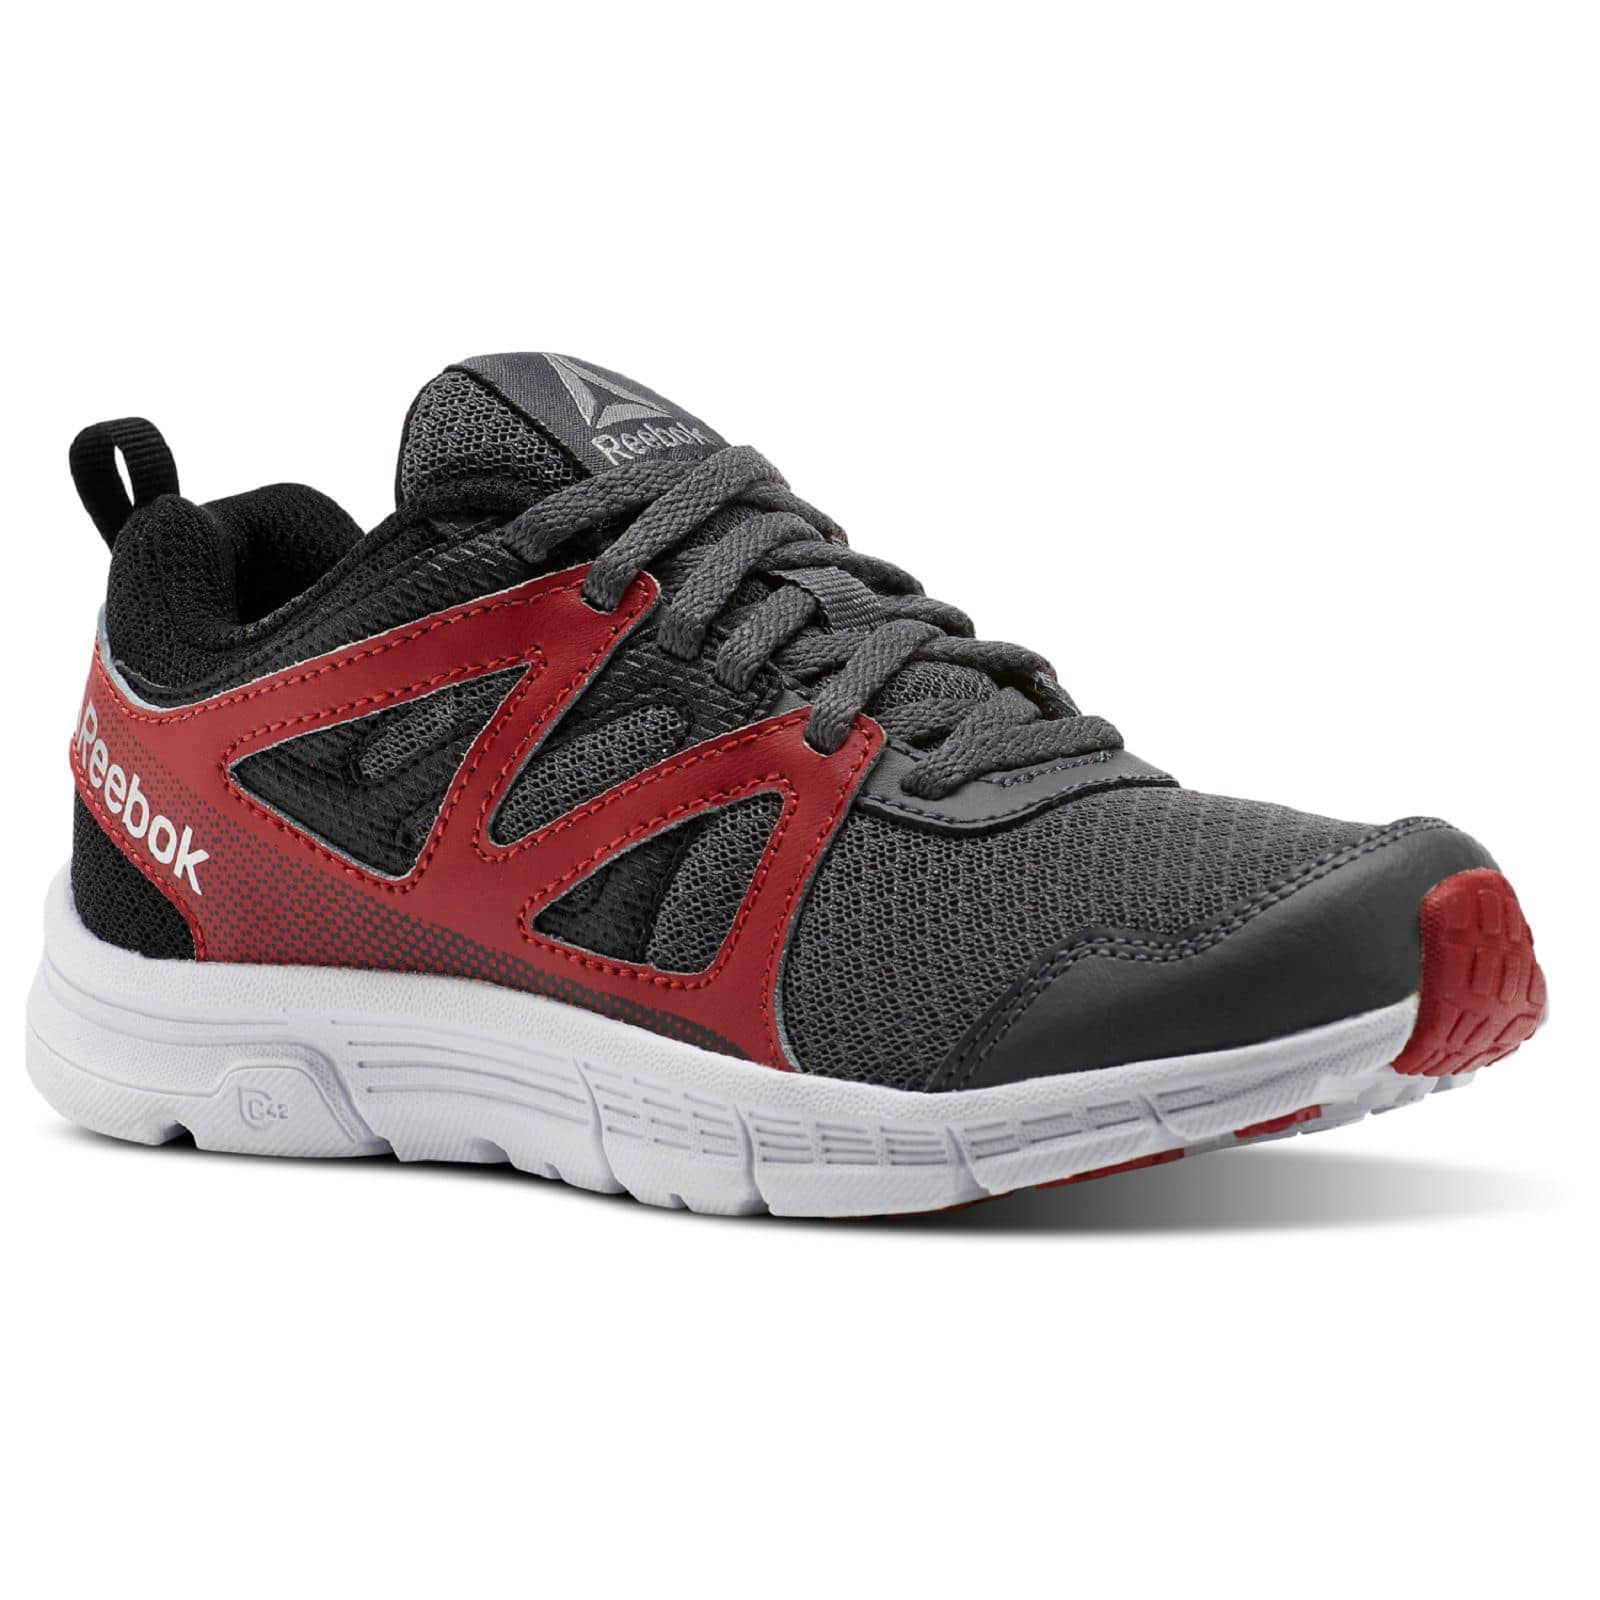 2dd6829e7 Reebok Boys' Run Supreme 2.0 Running Shoe - Gray/Red/Black $31.79 ...